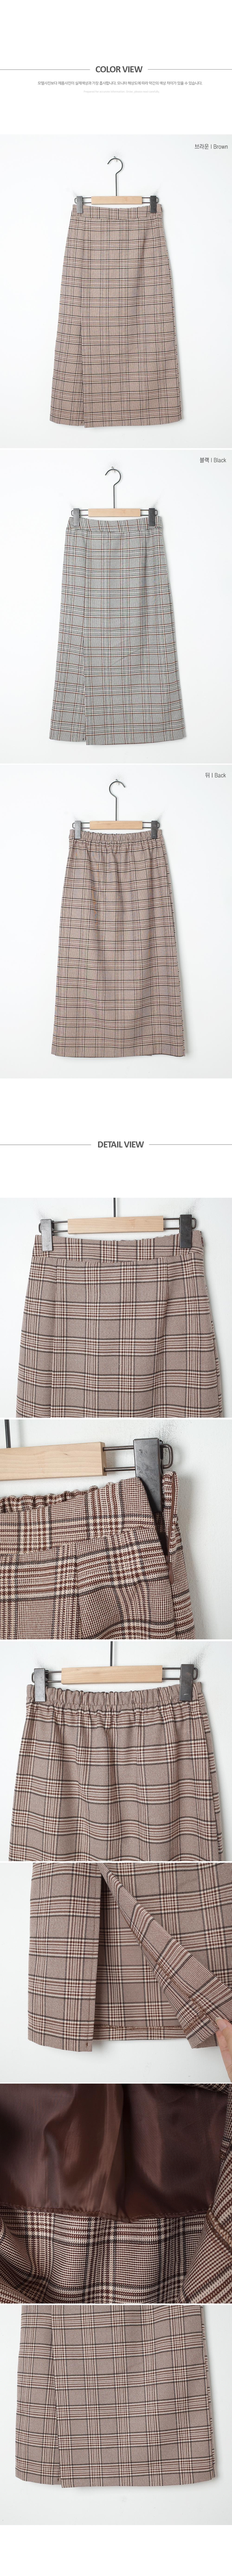 Tantan check long skirt